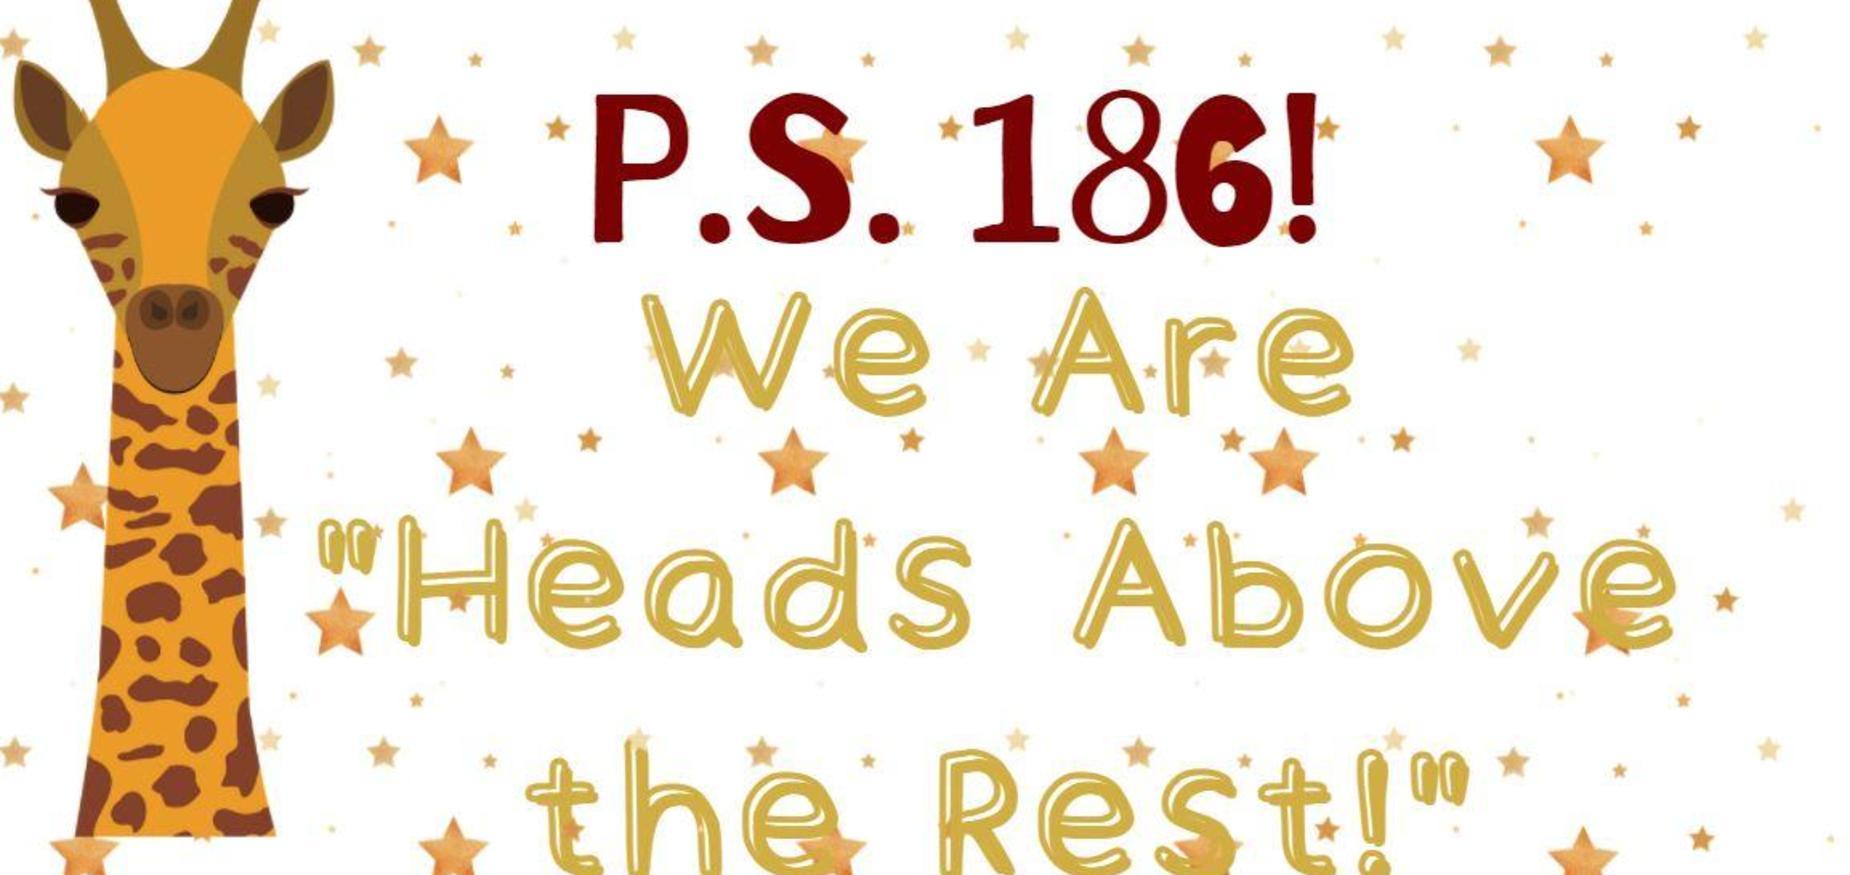 PS 186